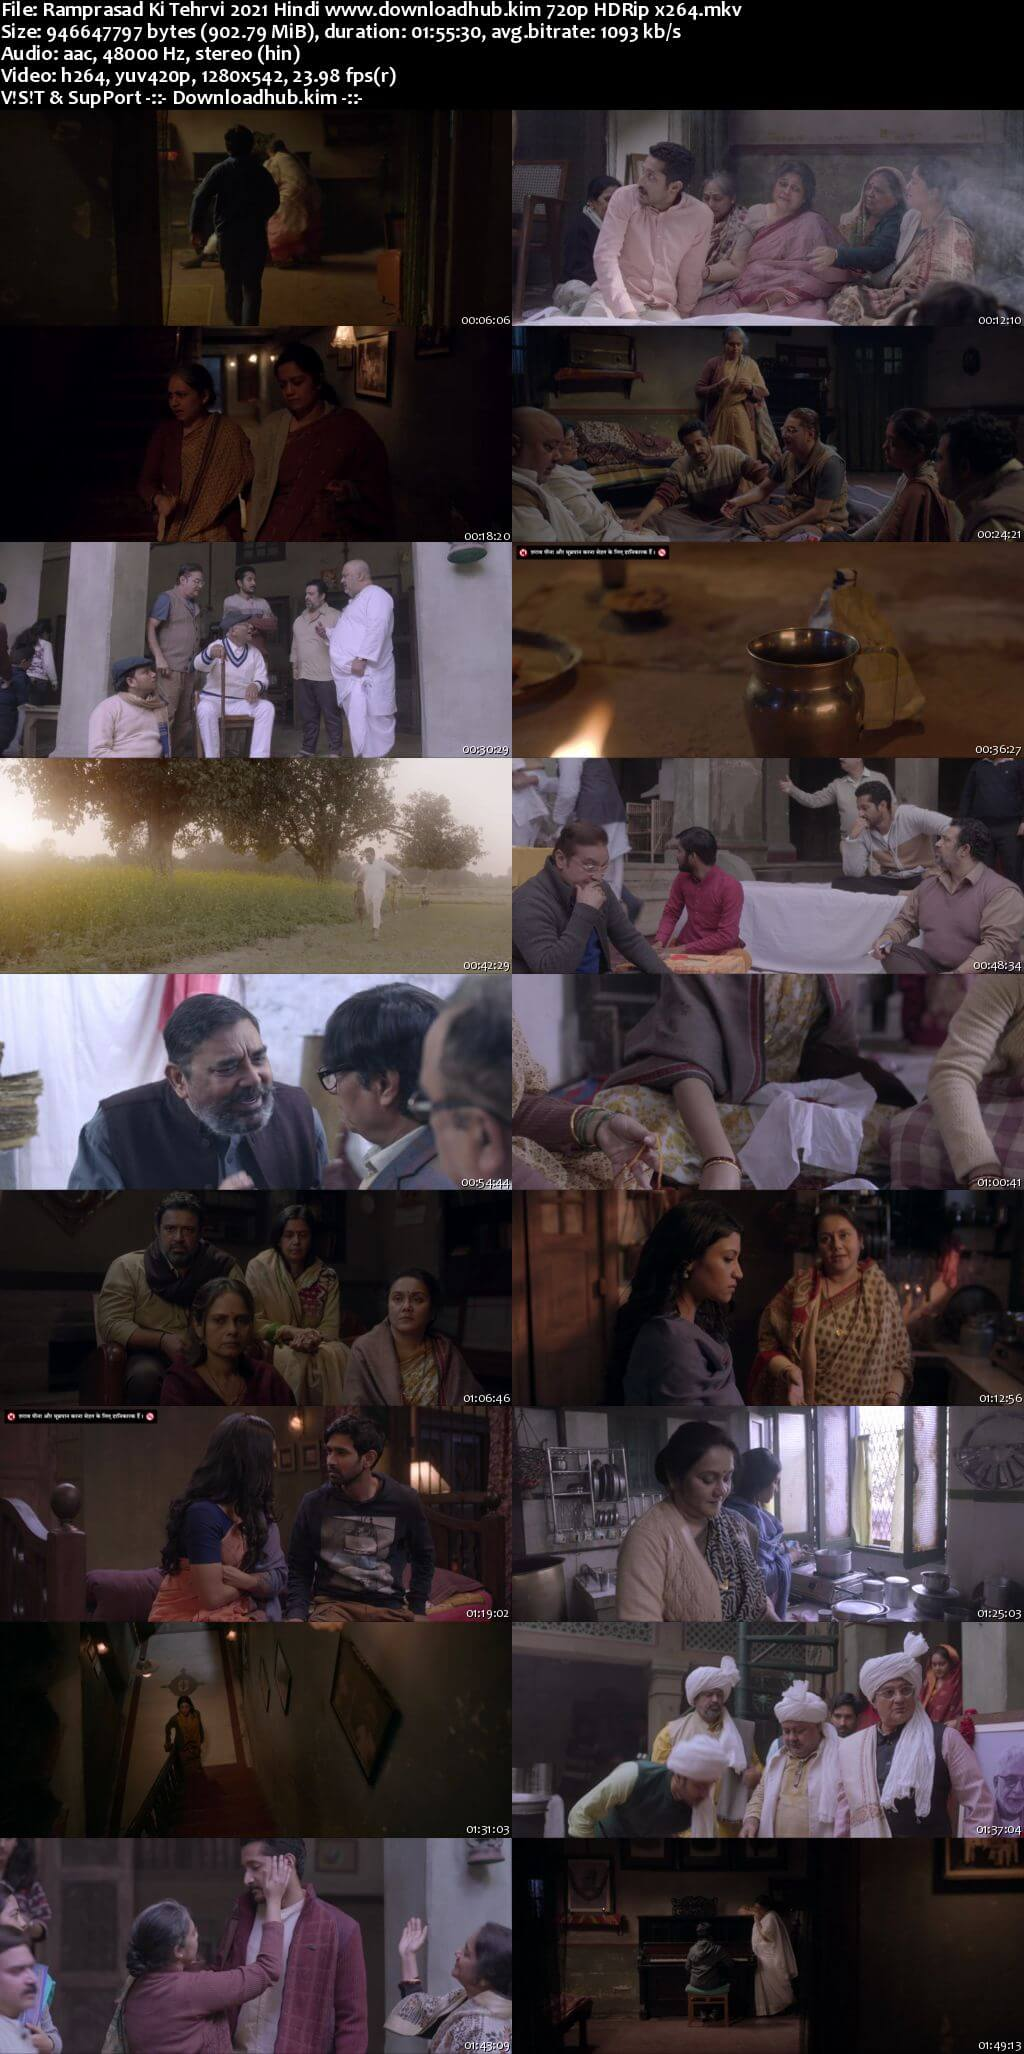 Ramprasad Ki Tehrvi 2021 Hindi 720p HDRip x264